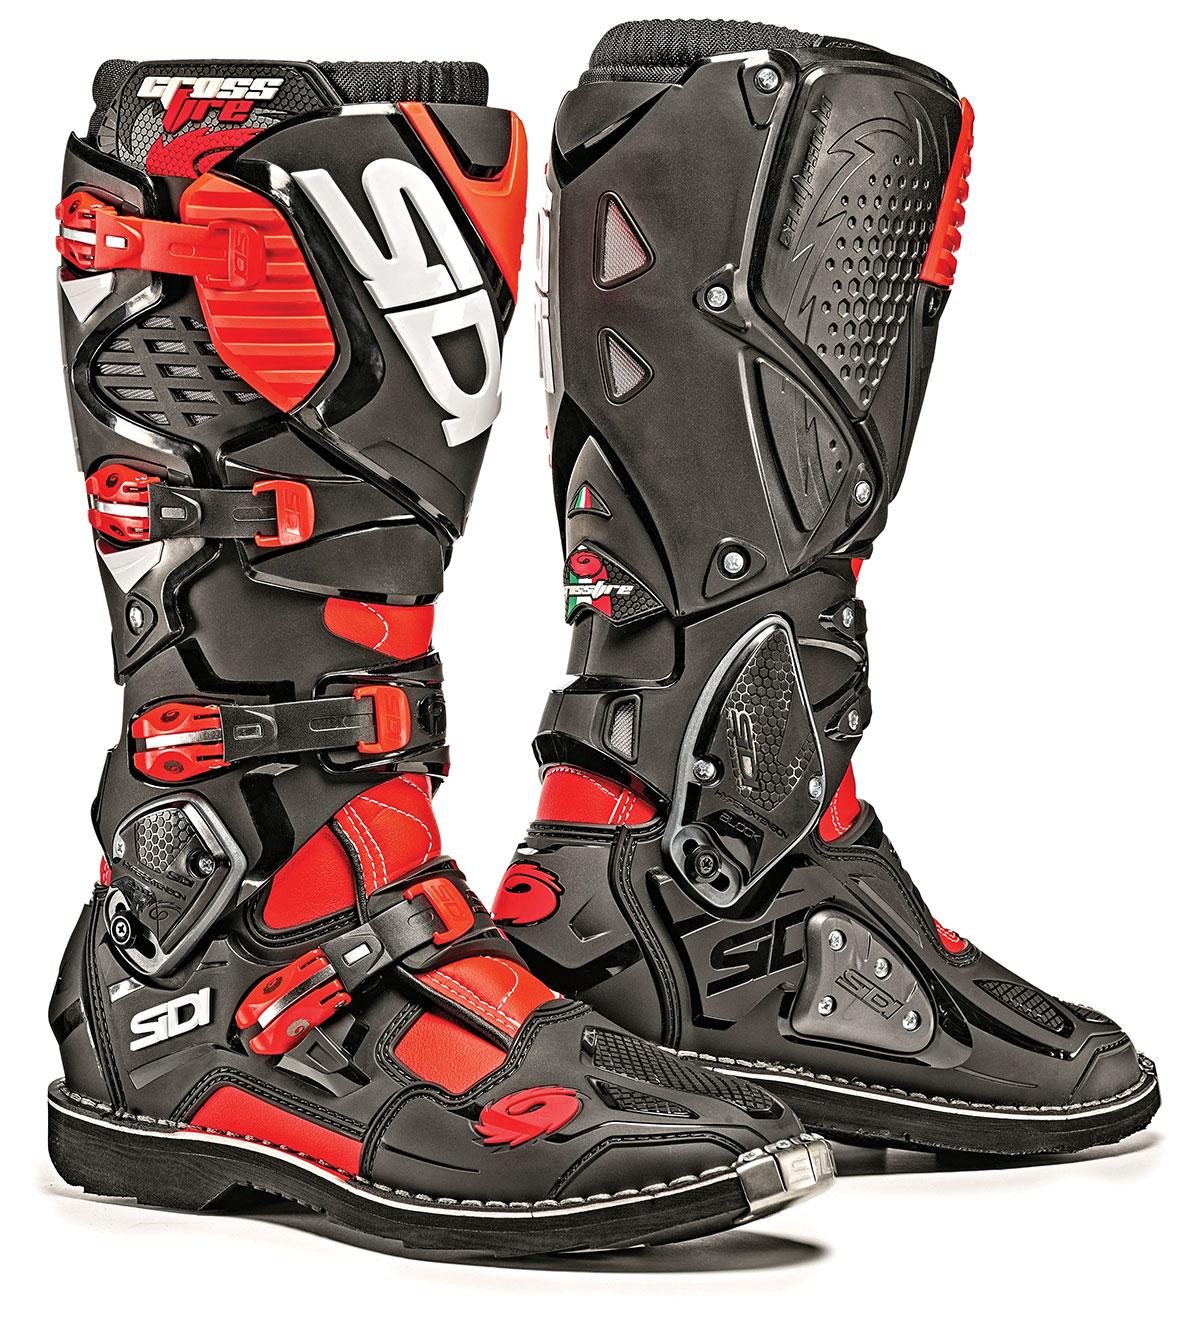 Crossfire 3 TA Offroad Boots